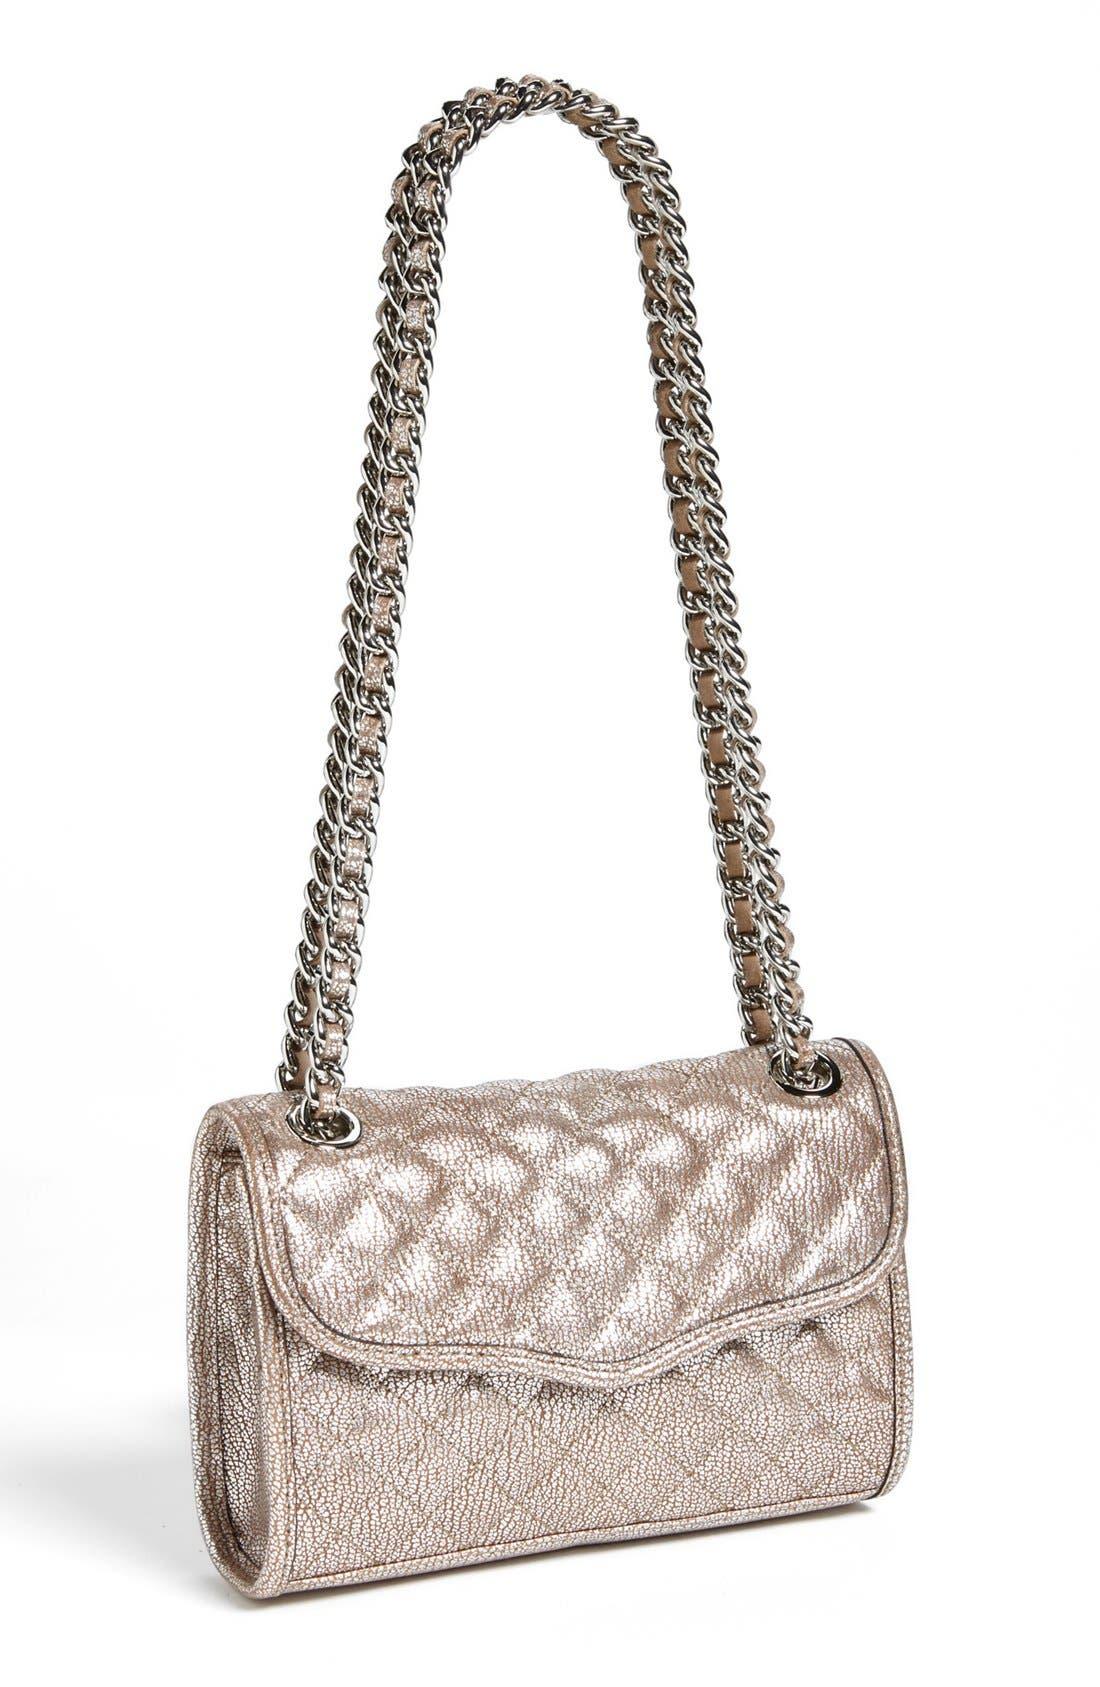 Main Image - Rebecca Minkoff 'Affair - Mini' Quilted Convertible Crossbody Bag